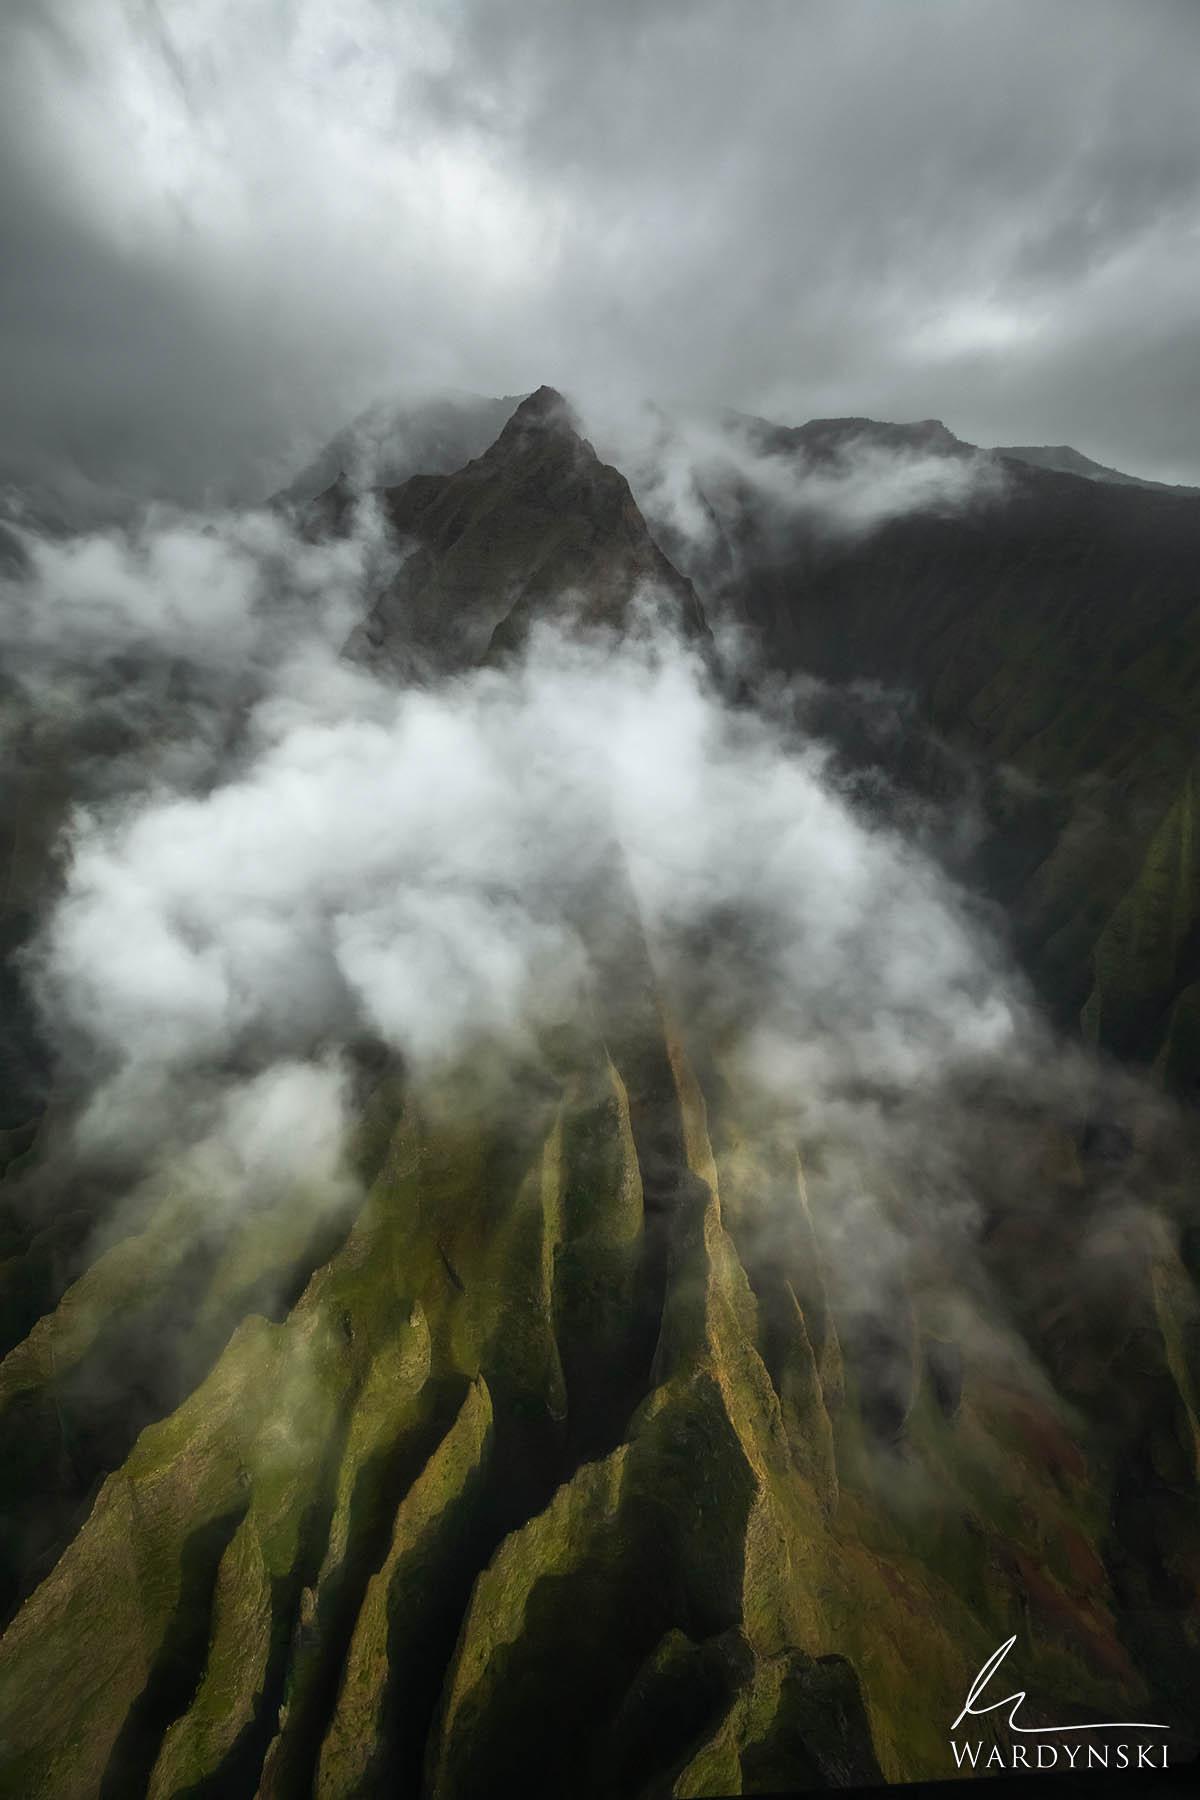 Fine Art Print | Limited Edition of 50  Clouds and fog form around the peaks of the Na Pali Coast on the Hawaiian Island of Kauai...